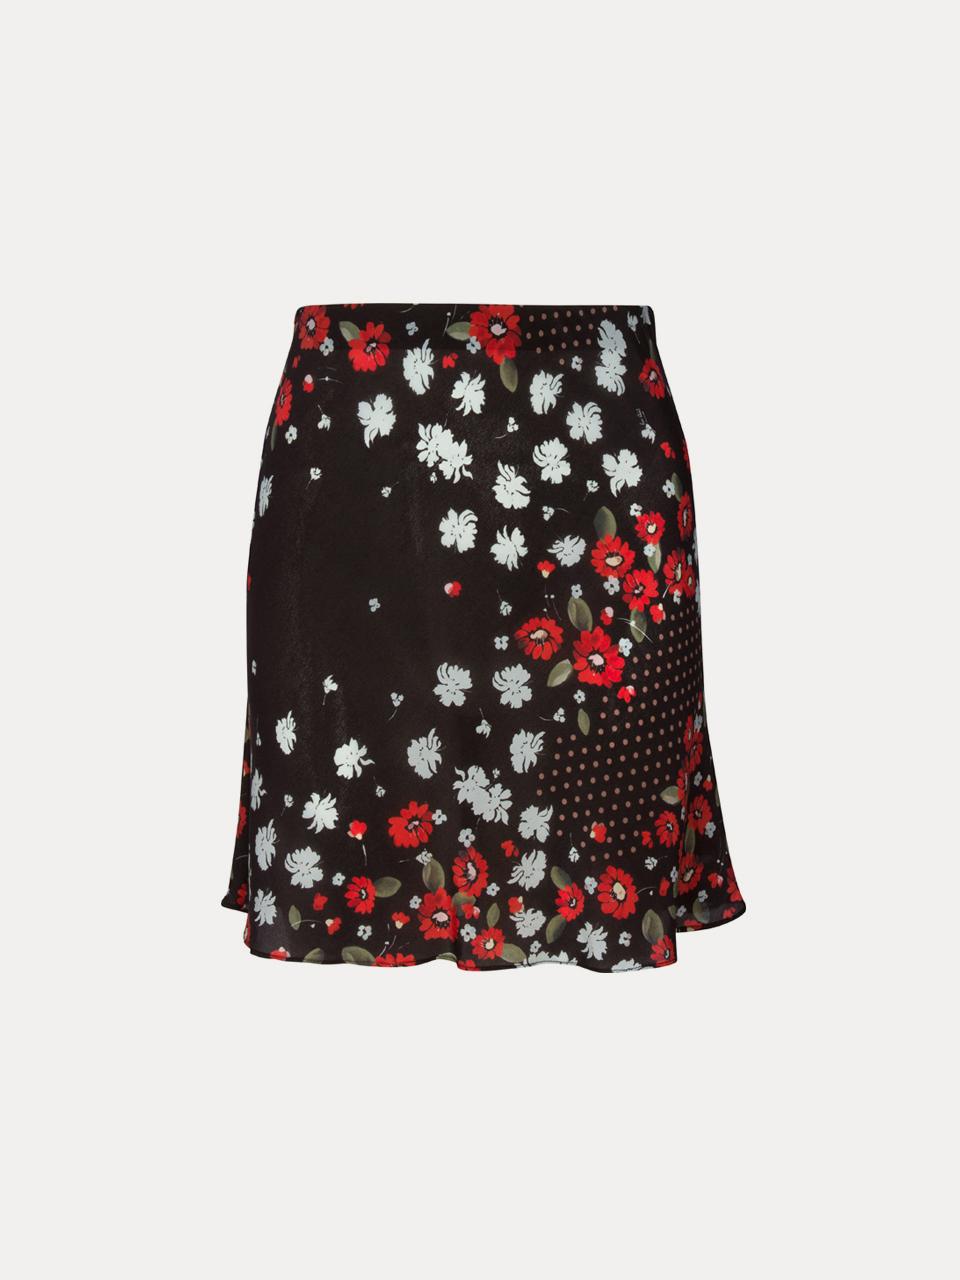 EU M. Red and White Print Mini Skirt Size UK 12